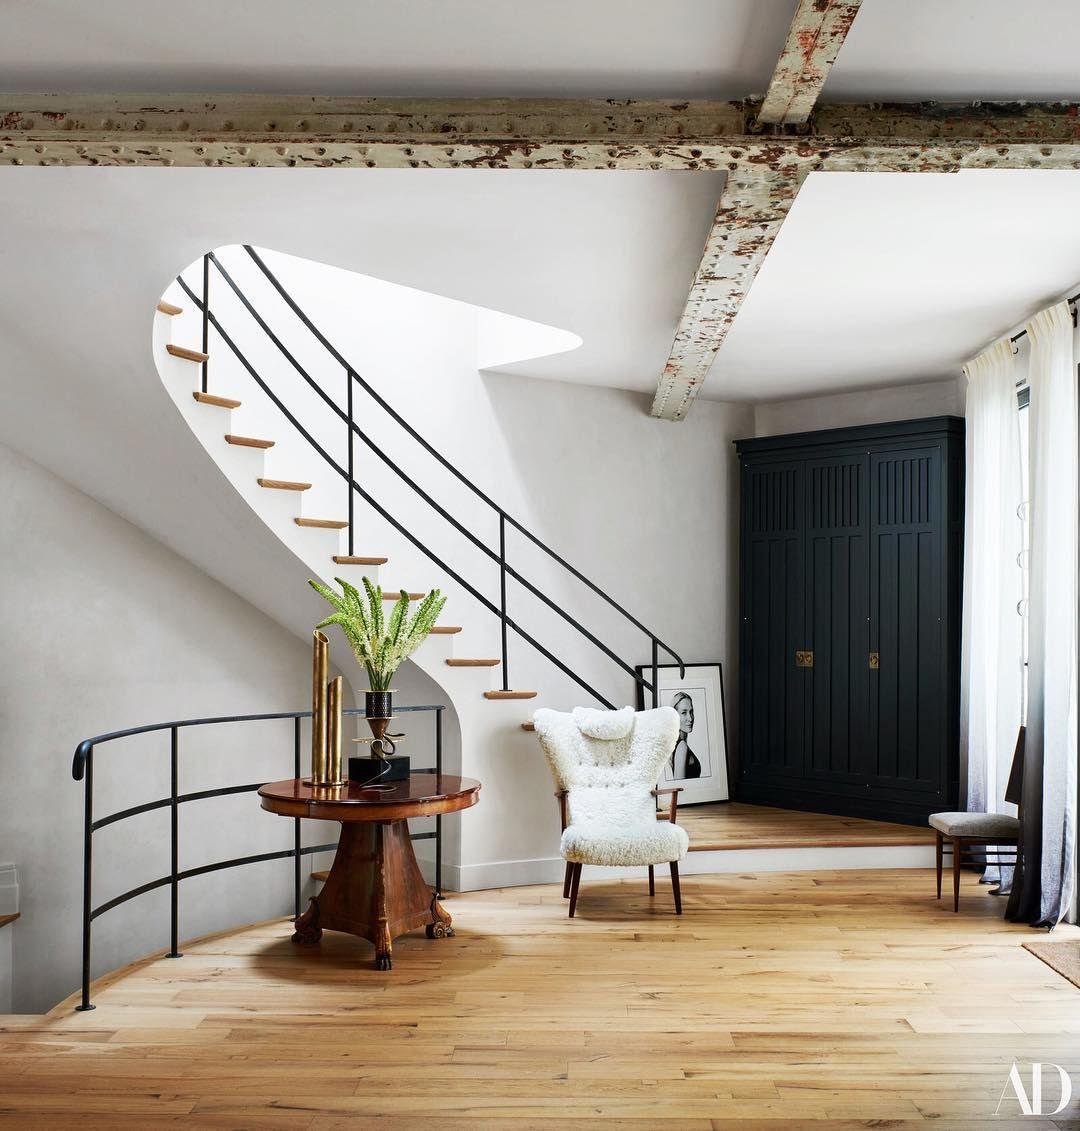 Trace Lehnhoff On Instagram In Paris The Home Of Soniarykiel